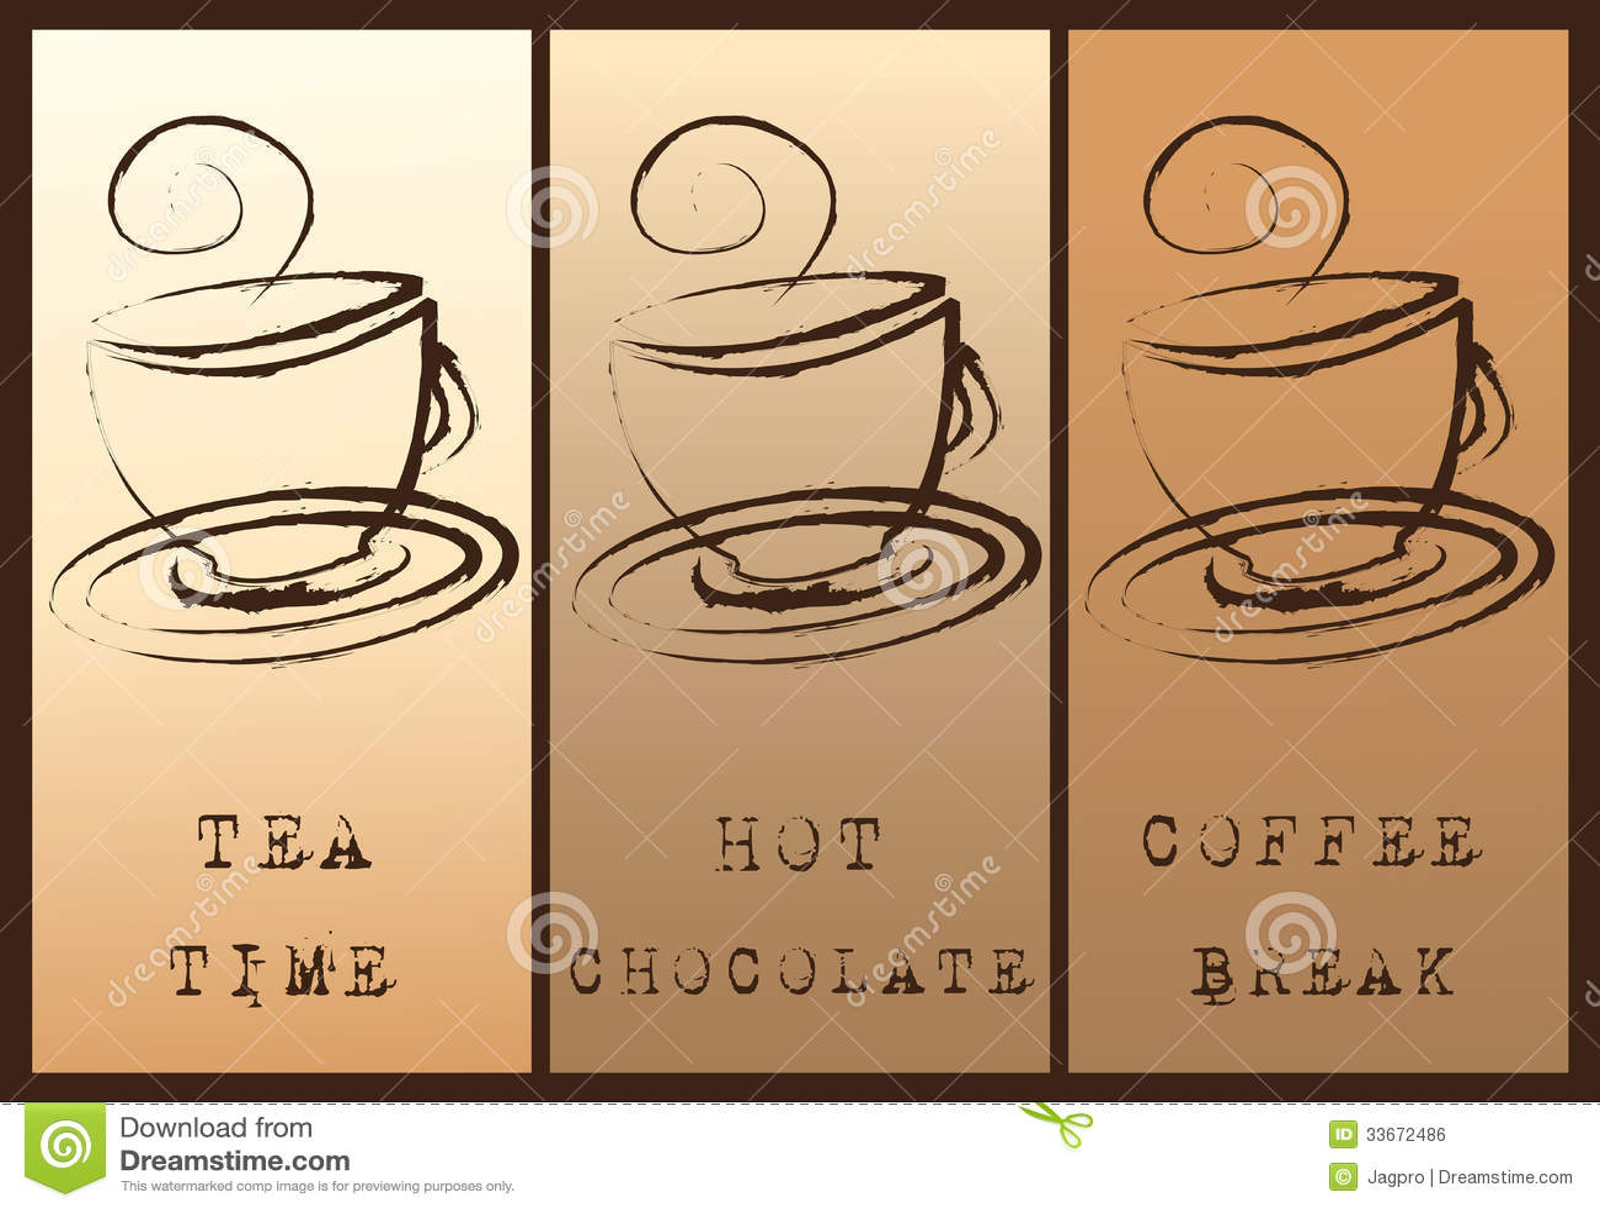 Coffee, Tea Or Hot Chocolate Stock Photos - Image: 2986083